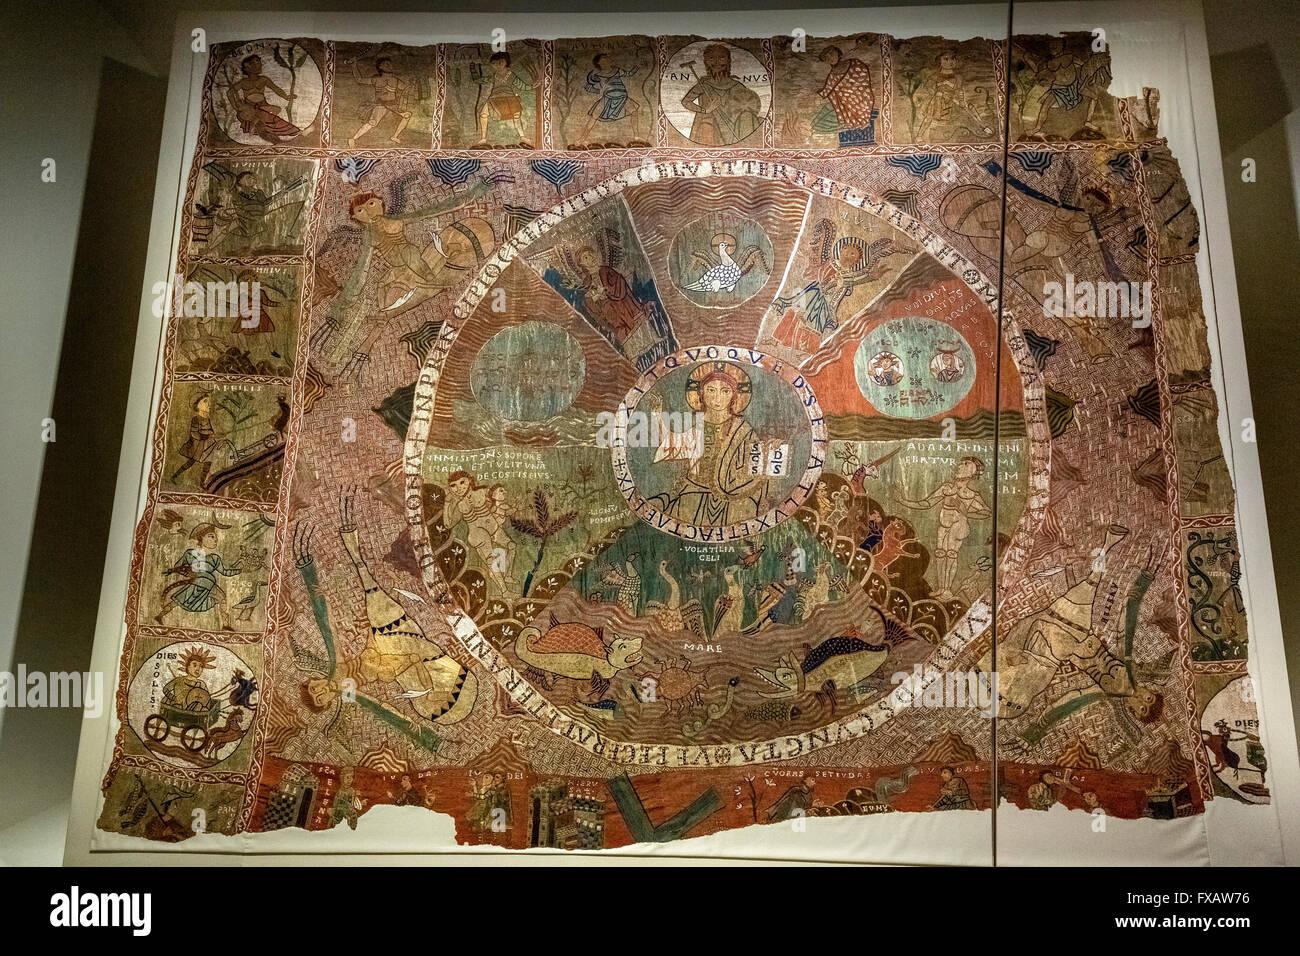 tapis de la creació, creation carpet from the 11th century, Santa Maria Cathedral of Gerona, the center of - Stock Image